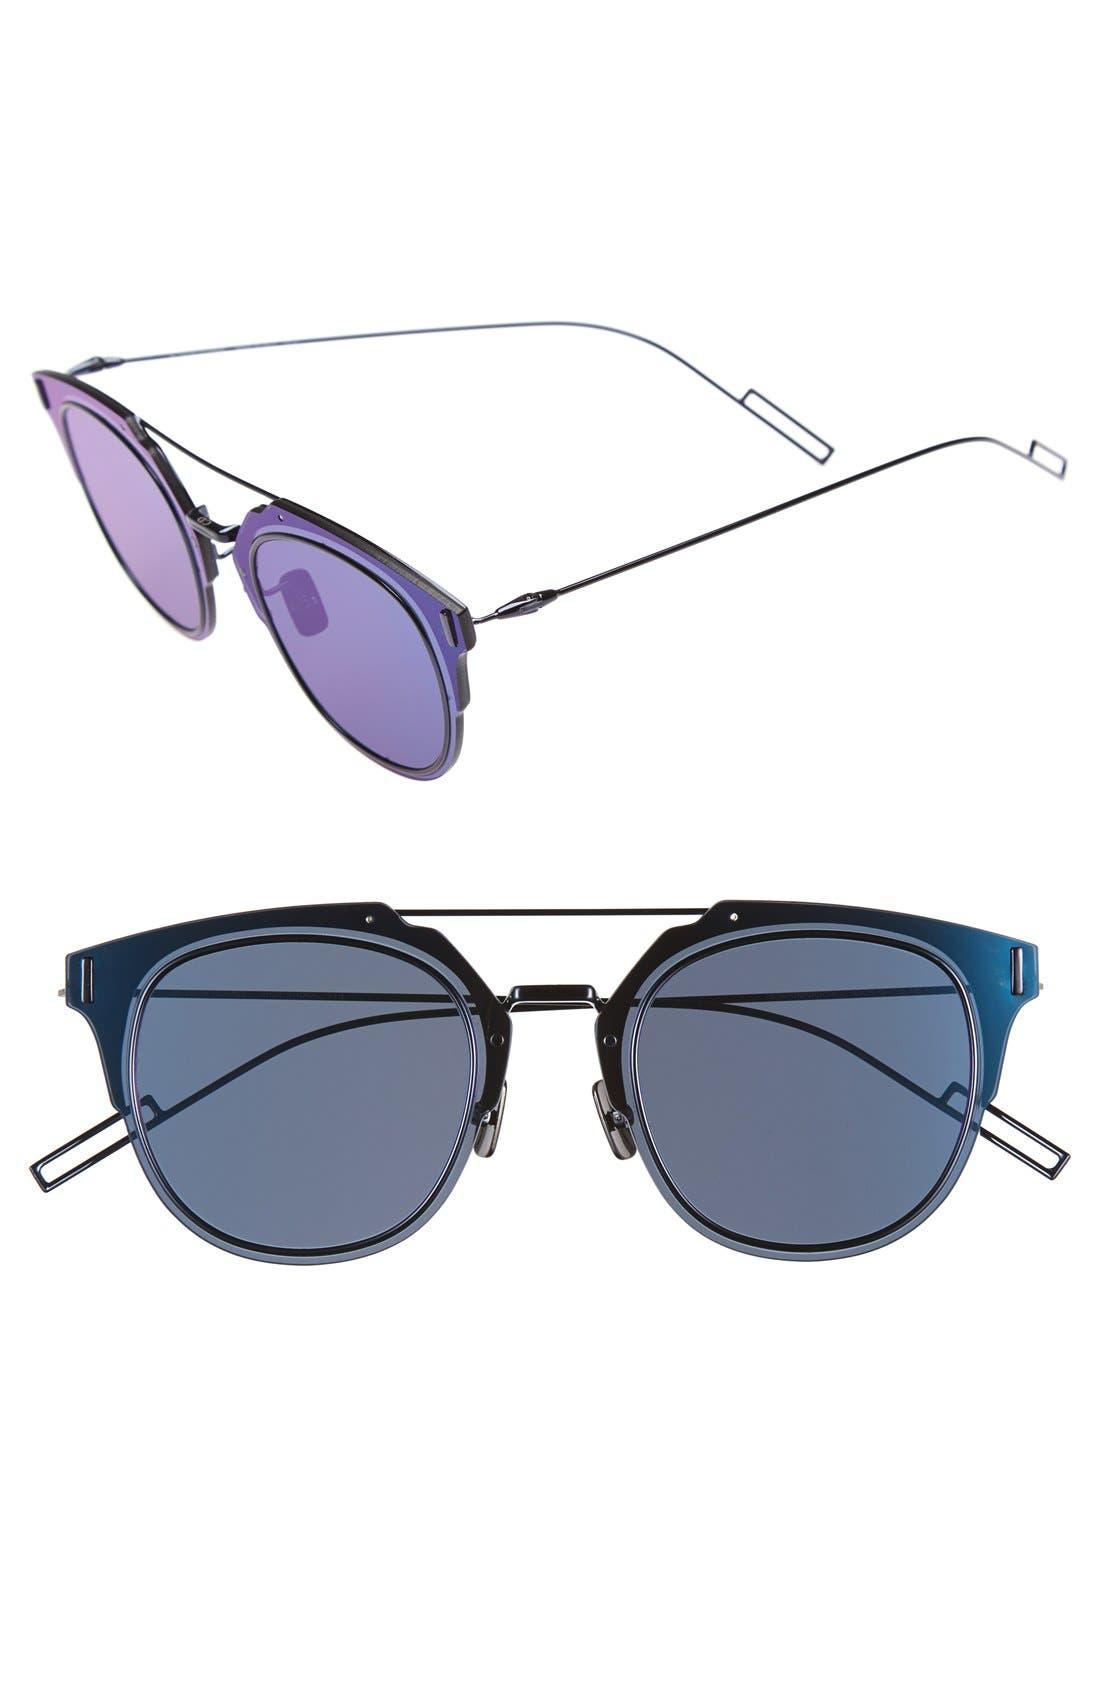 db7a140795f Dior Homme  Composit 1.0S  62Mm Metal Shield Sunglasses - Shiny Blue  Ruthenium